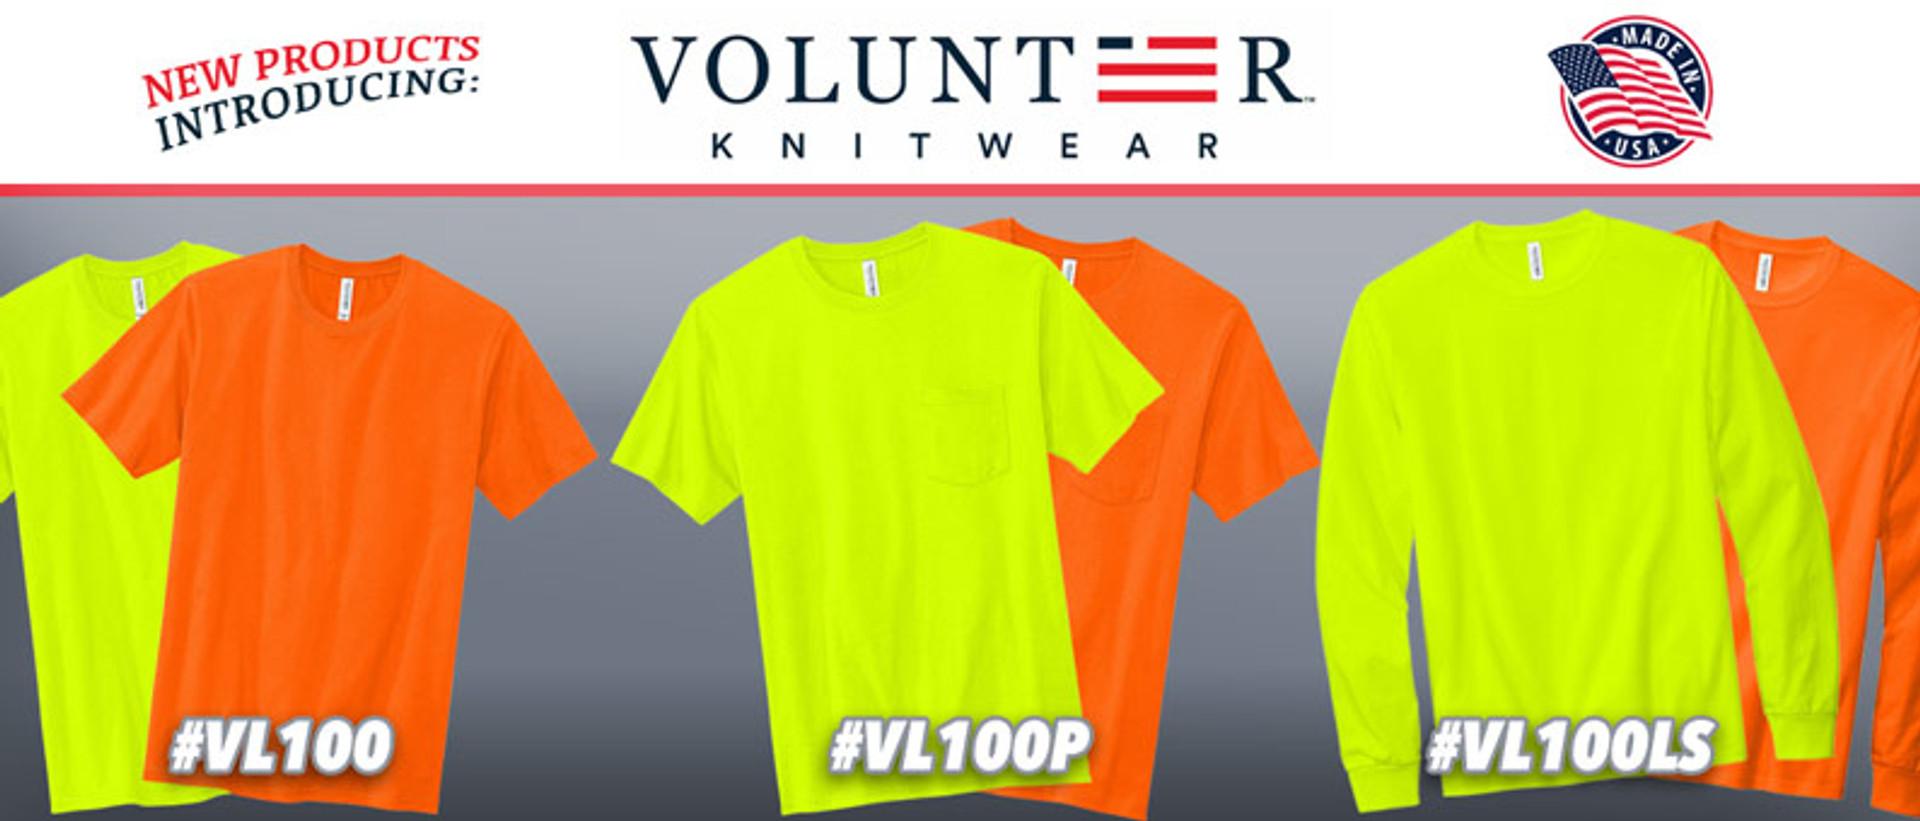 Volunteer Knitwear Products